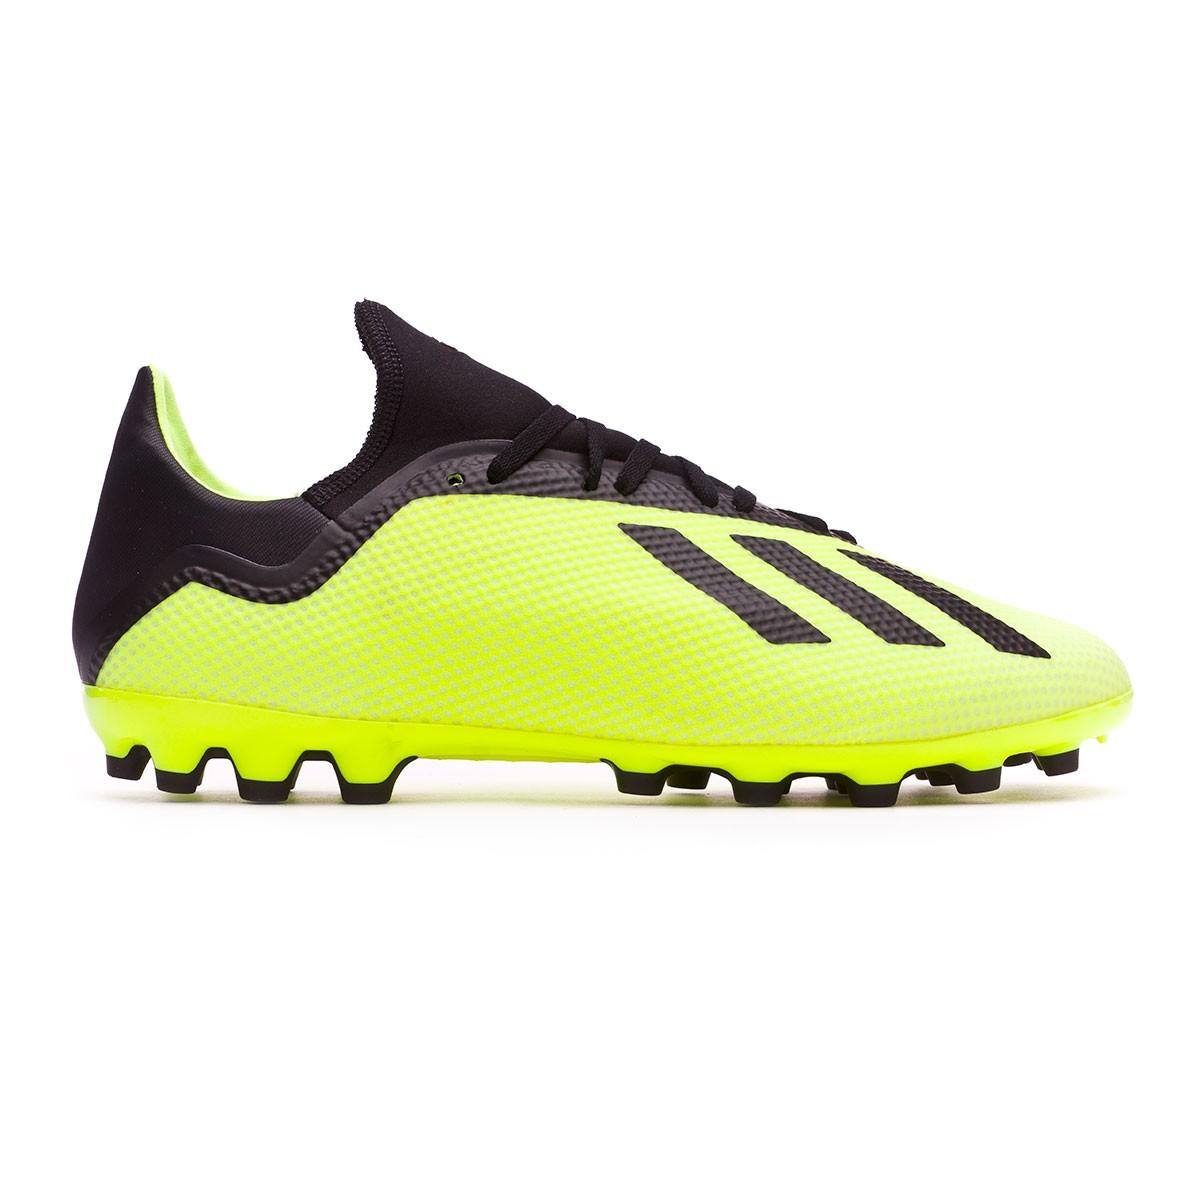 006c5939bda1 Football Boots adidas X 18.3 AG Solar yellow-Core black-White - Football  store Fútbol Emotion